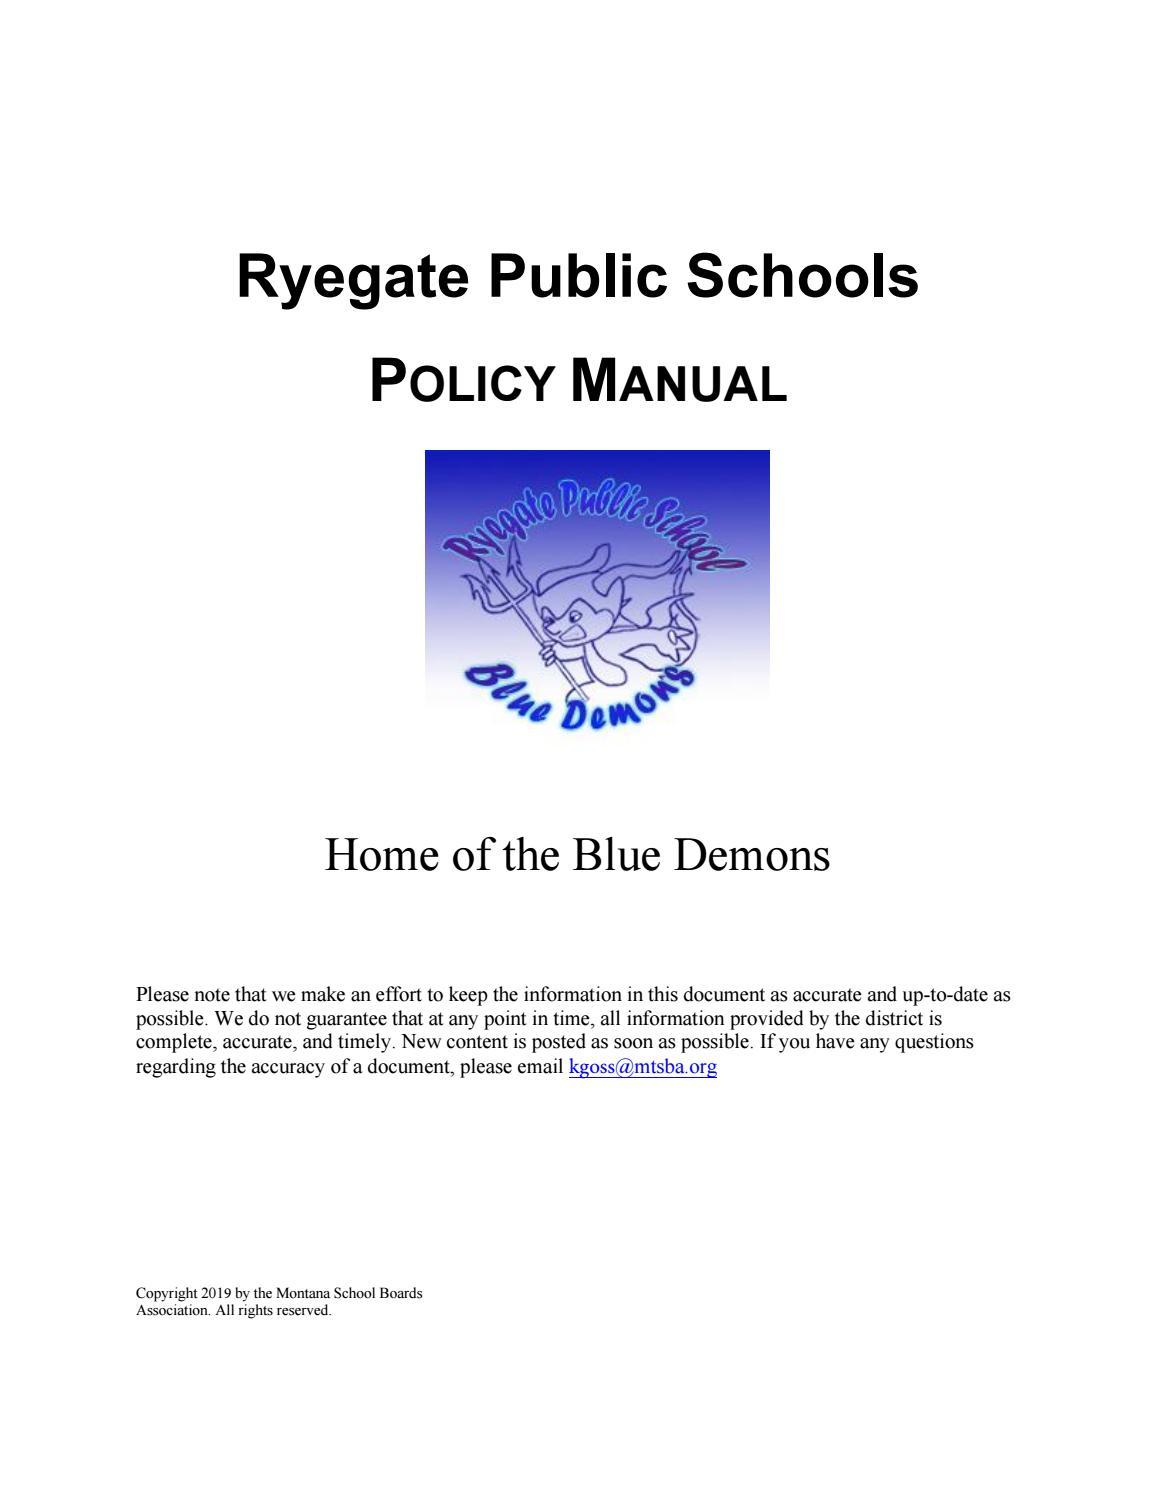 Ryegate Public Schools Policy Manual by Montana School